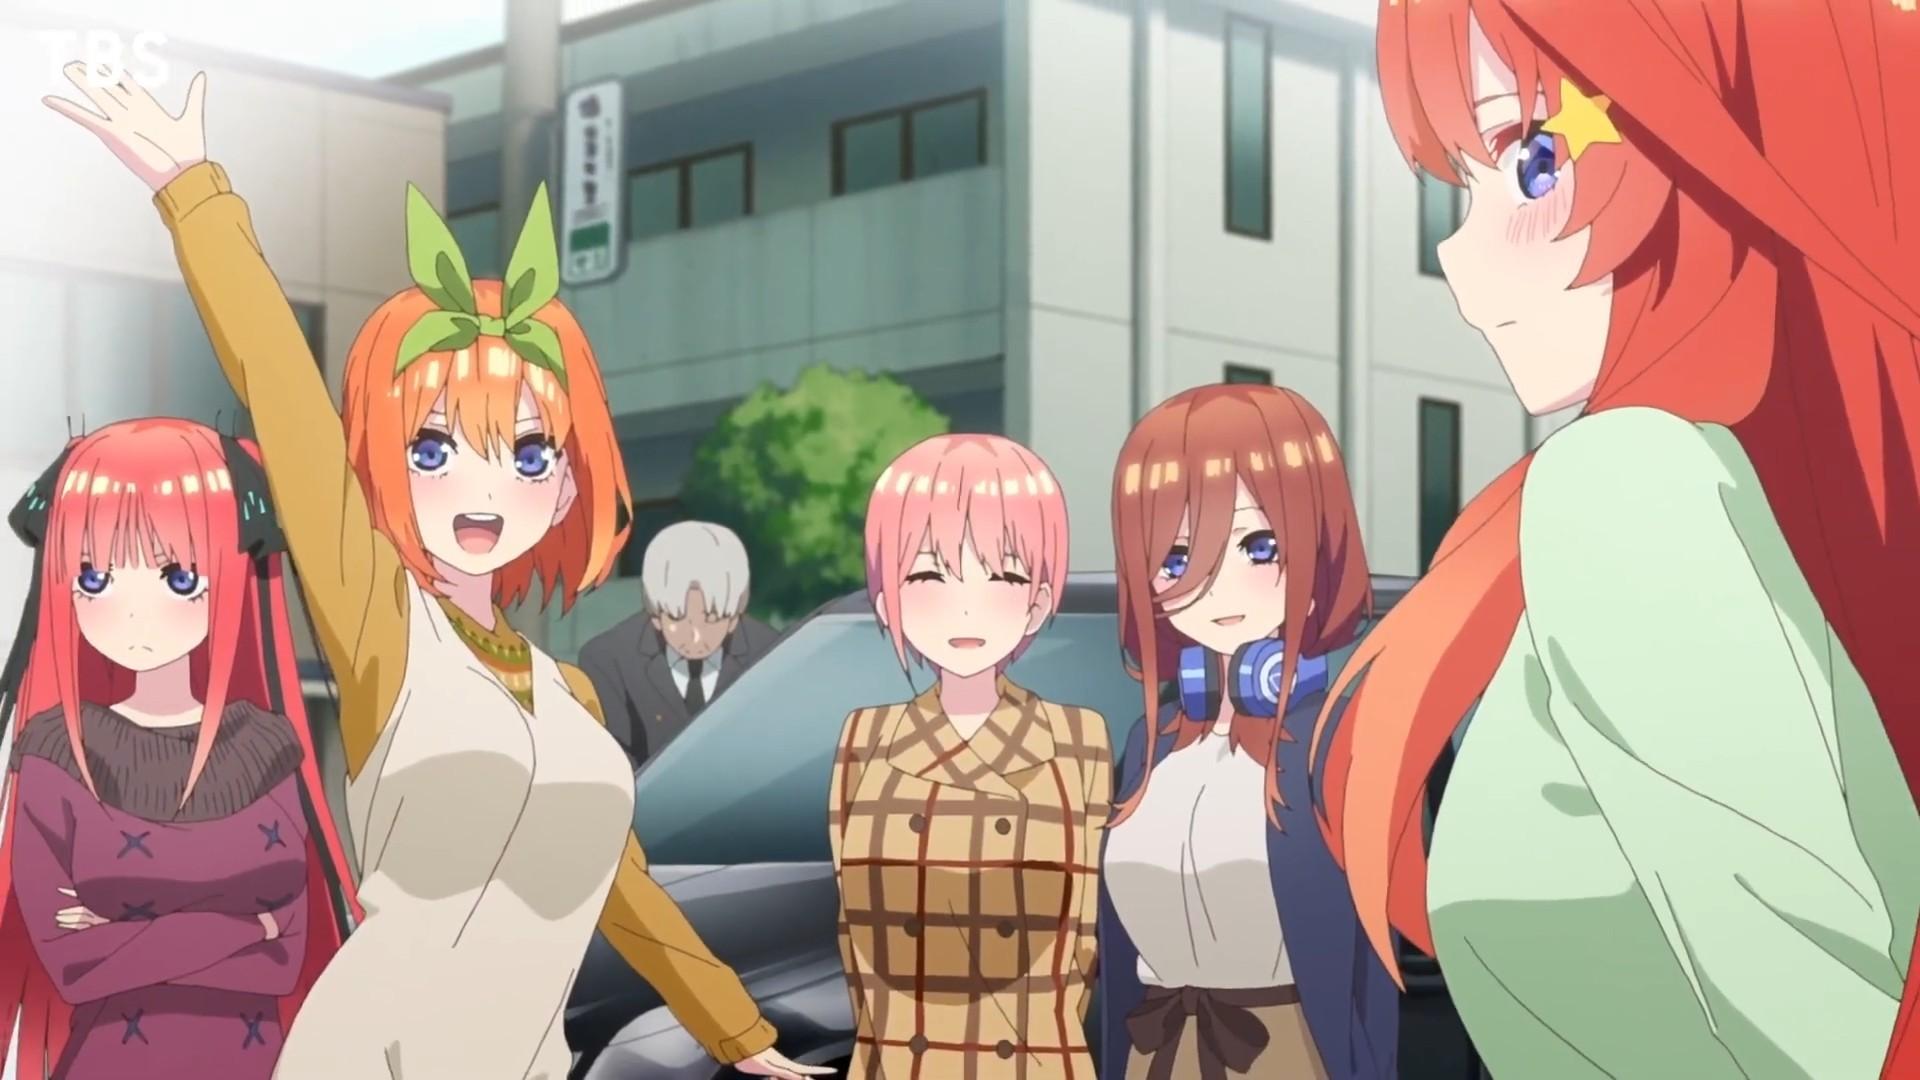 TV动画《五等分的新娘》第二季番宣CM公开,2021年1月播出- 布丁次元社